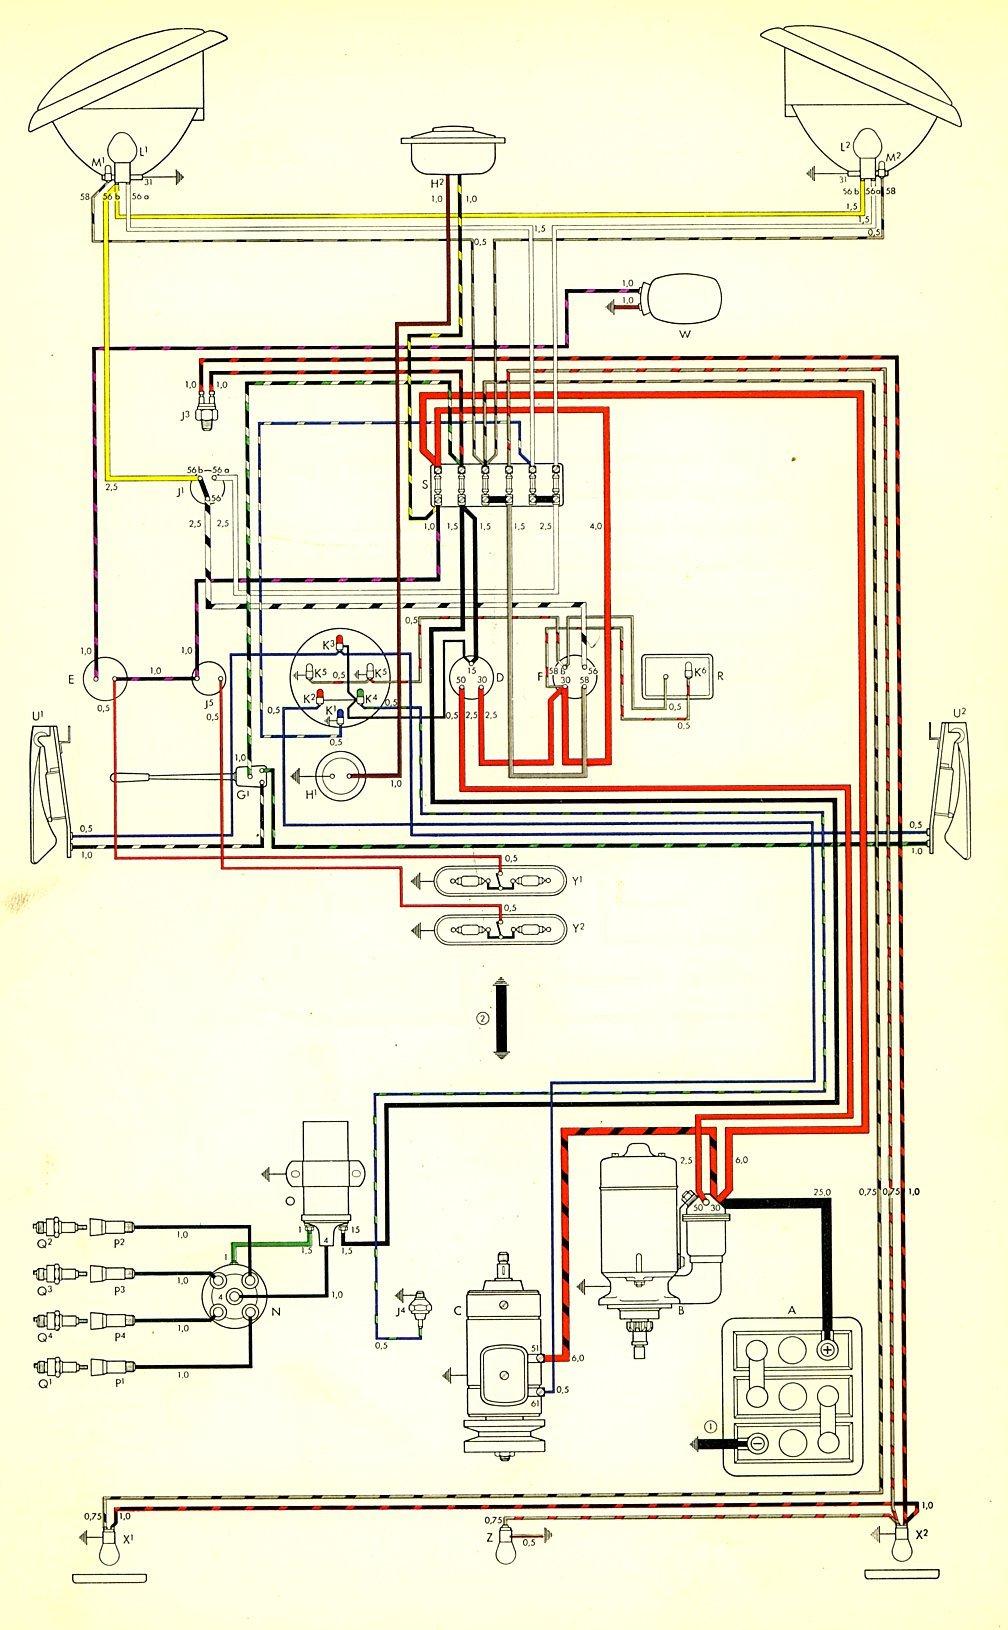 bus_59 Vw Polo Clic Wiring Diagram on vw distributor diagram, vw bug electronic ignition wiring, vw golf fuse diagram, vw carb diagram, vw generator diagram, vw engine diagram, vw steering diagrams, vw headlight wiring, vw wiring harness, vw beetle wiring, vw beetle diagram, volkswagen beetle body diagrams, vw bug wiper motor wiring, vw light switch wiring, electrical diagrams, vw cooling system diagram, vw engine wiring, vw fuel pump diagram, vw alternator wiring, vw fuse box diagram,